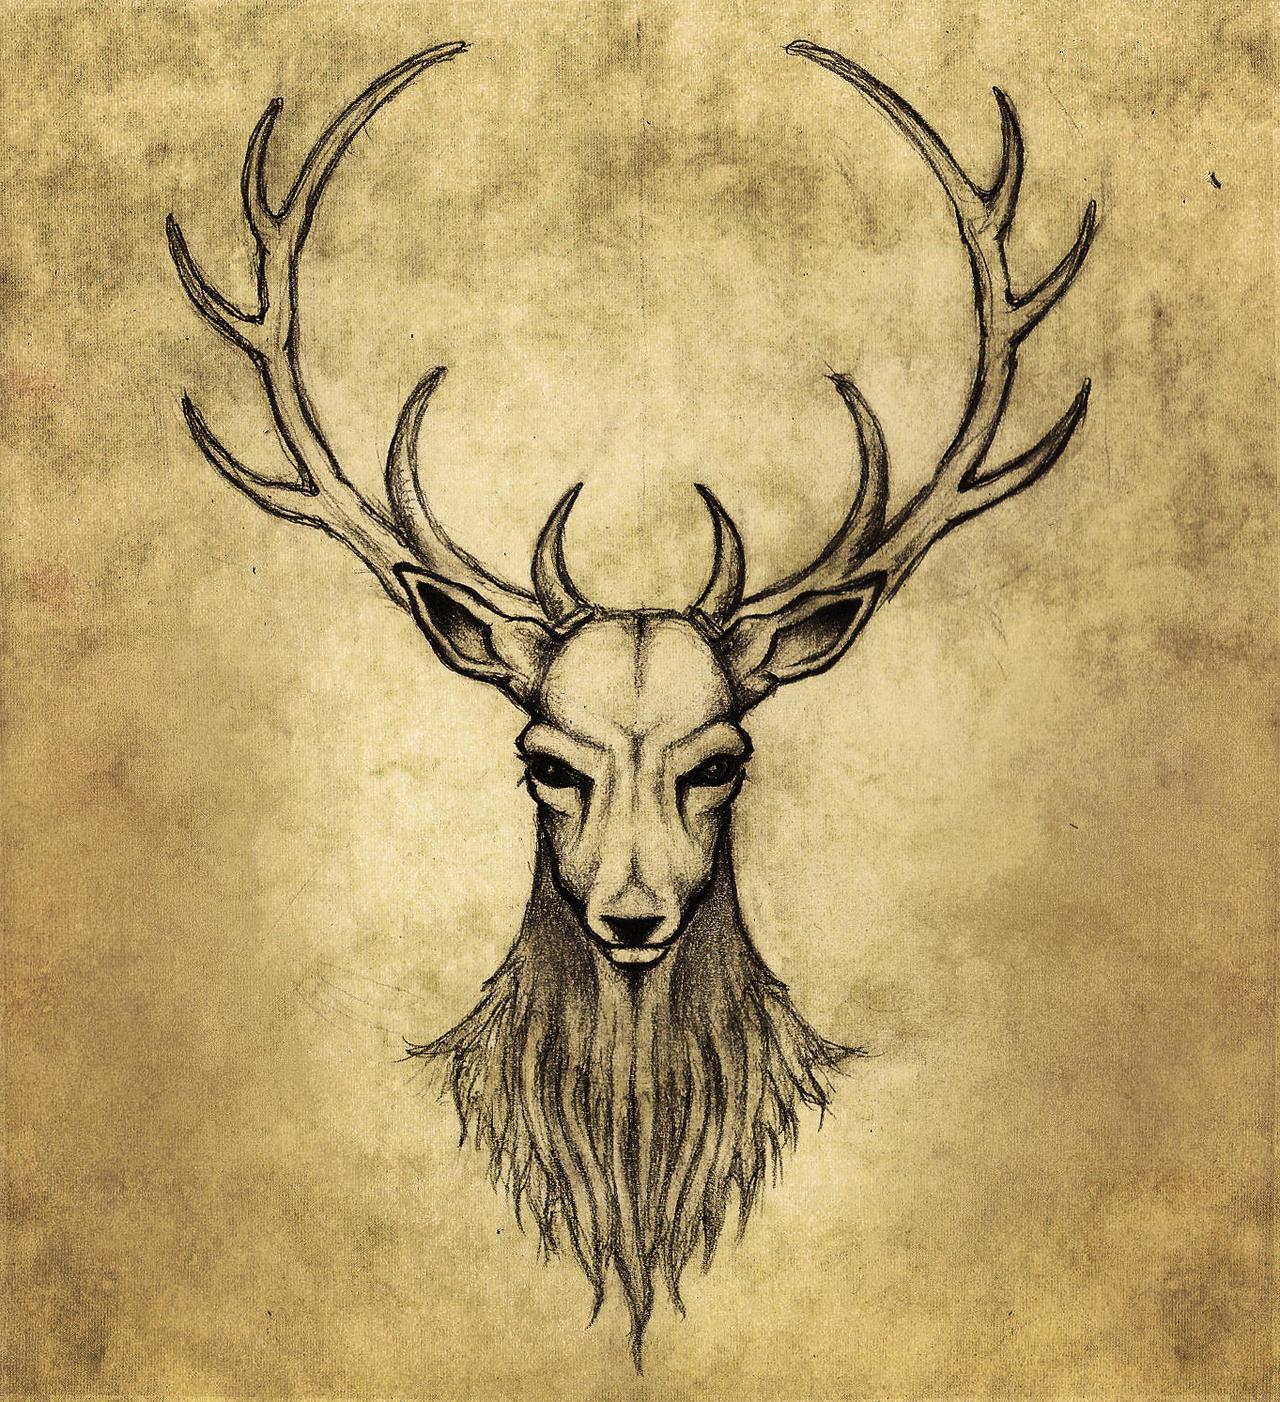 Oh My Deer By AnaKarniolska On DeviantArt